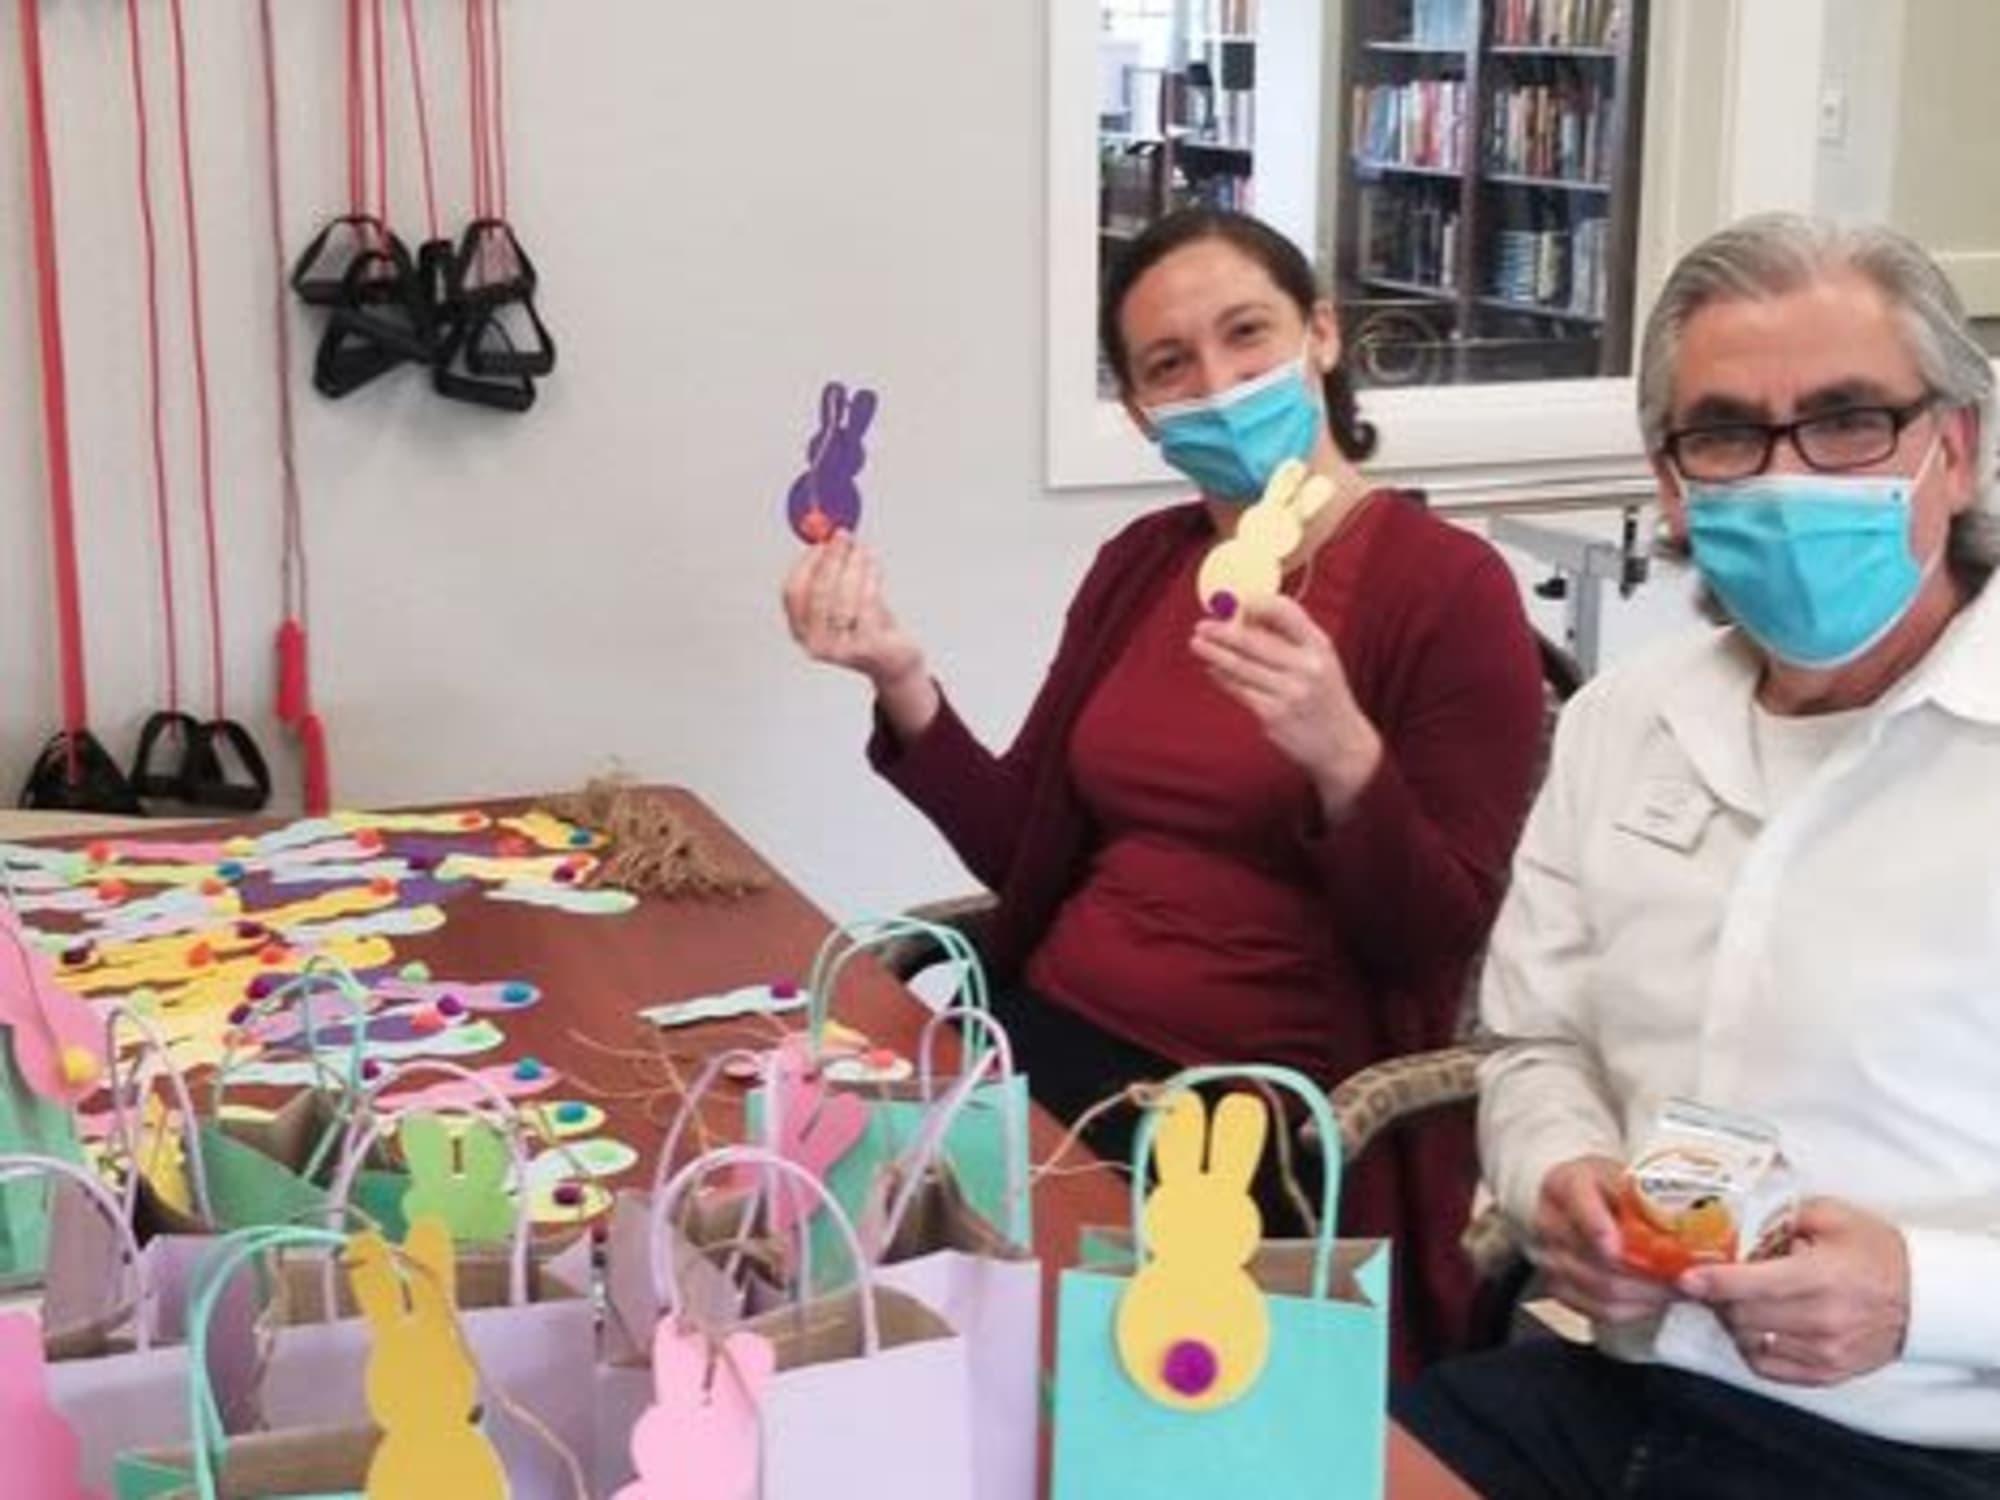 Residents having fun at Almond Heights in Orangevale, CA